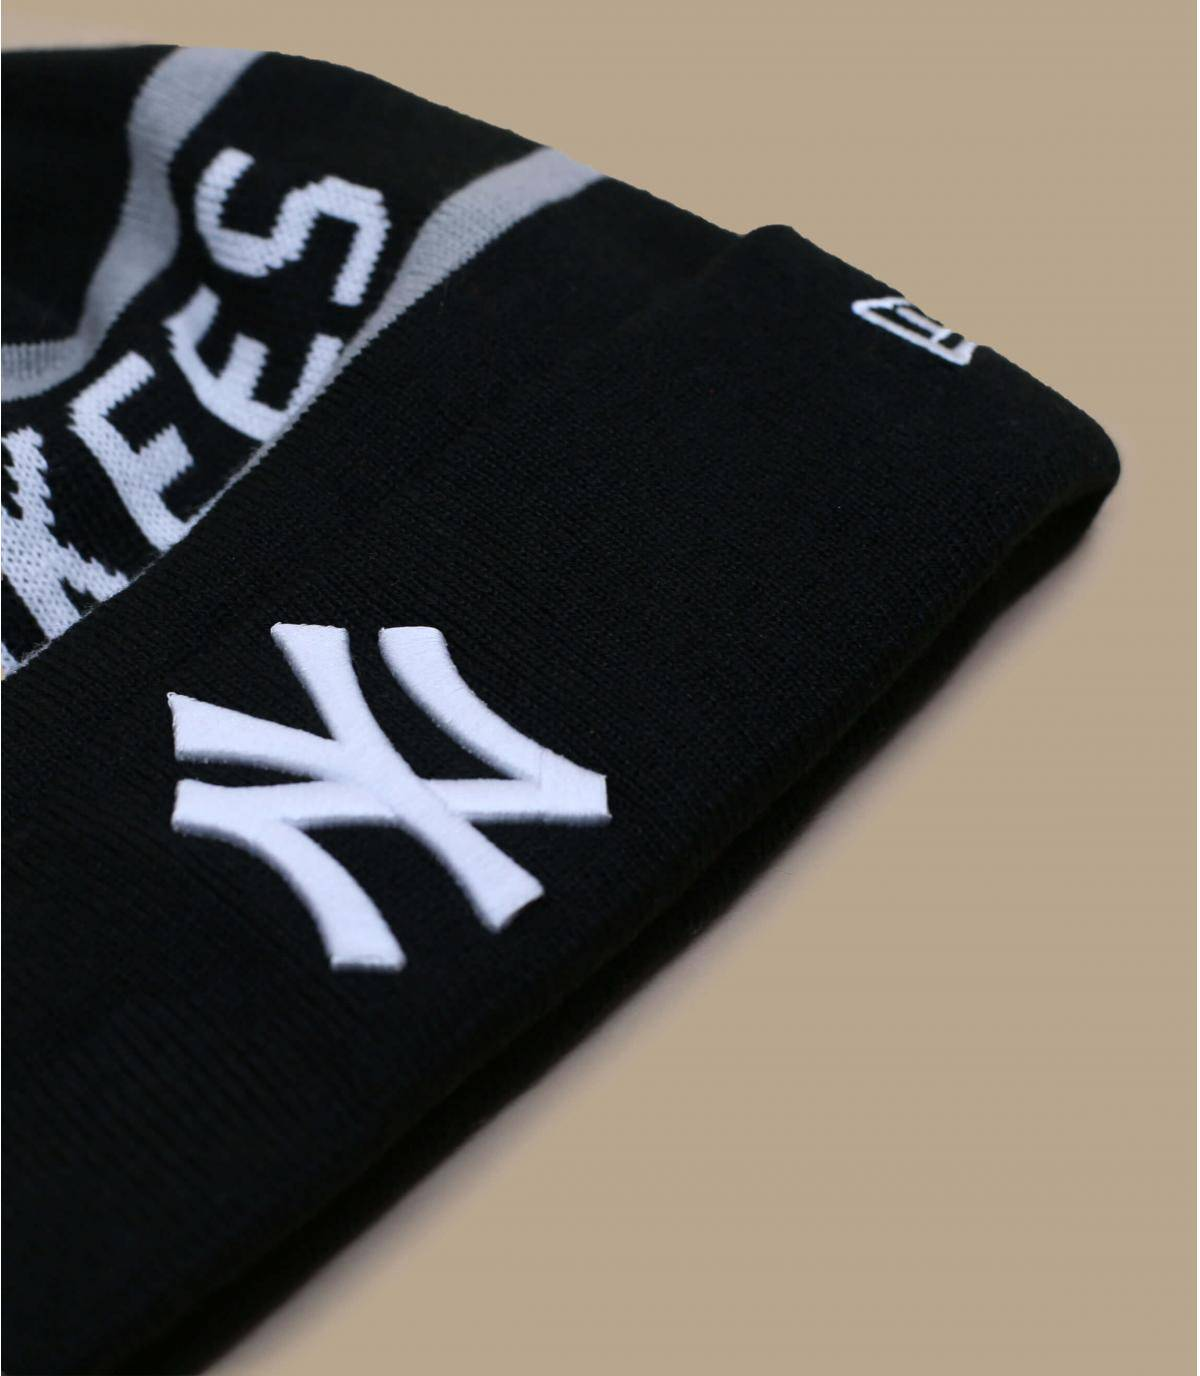 Details Jake Cuff Knit NY black - afbeeling 3